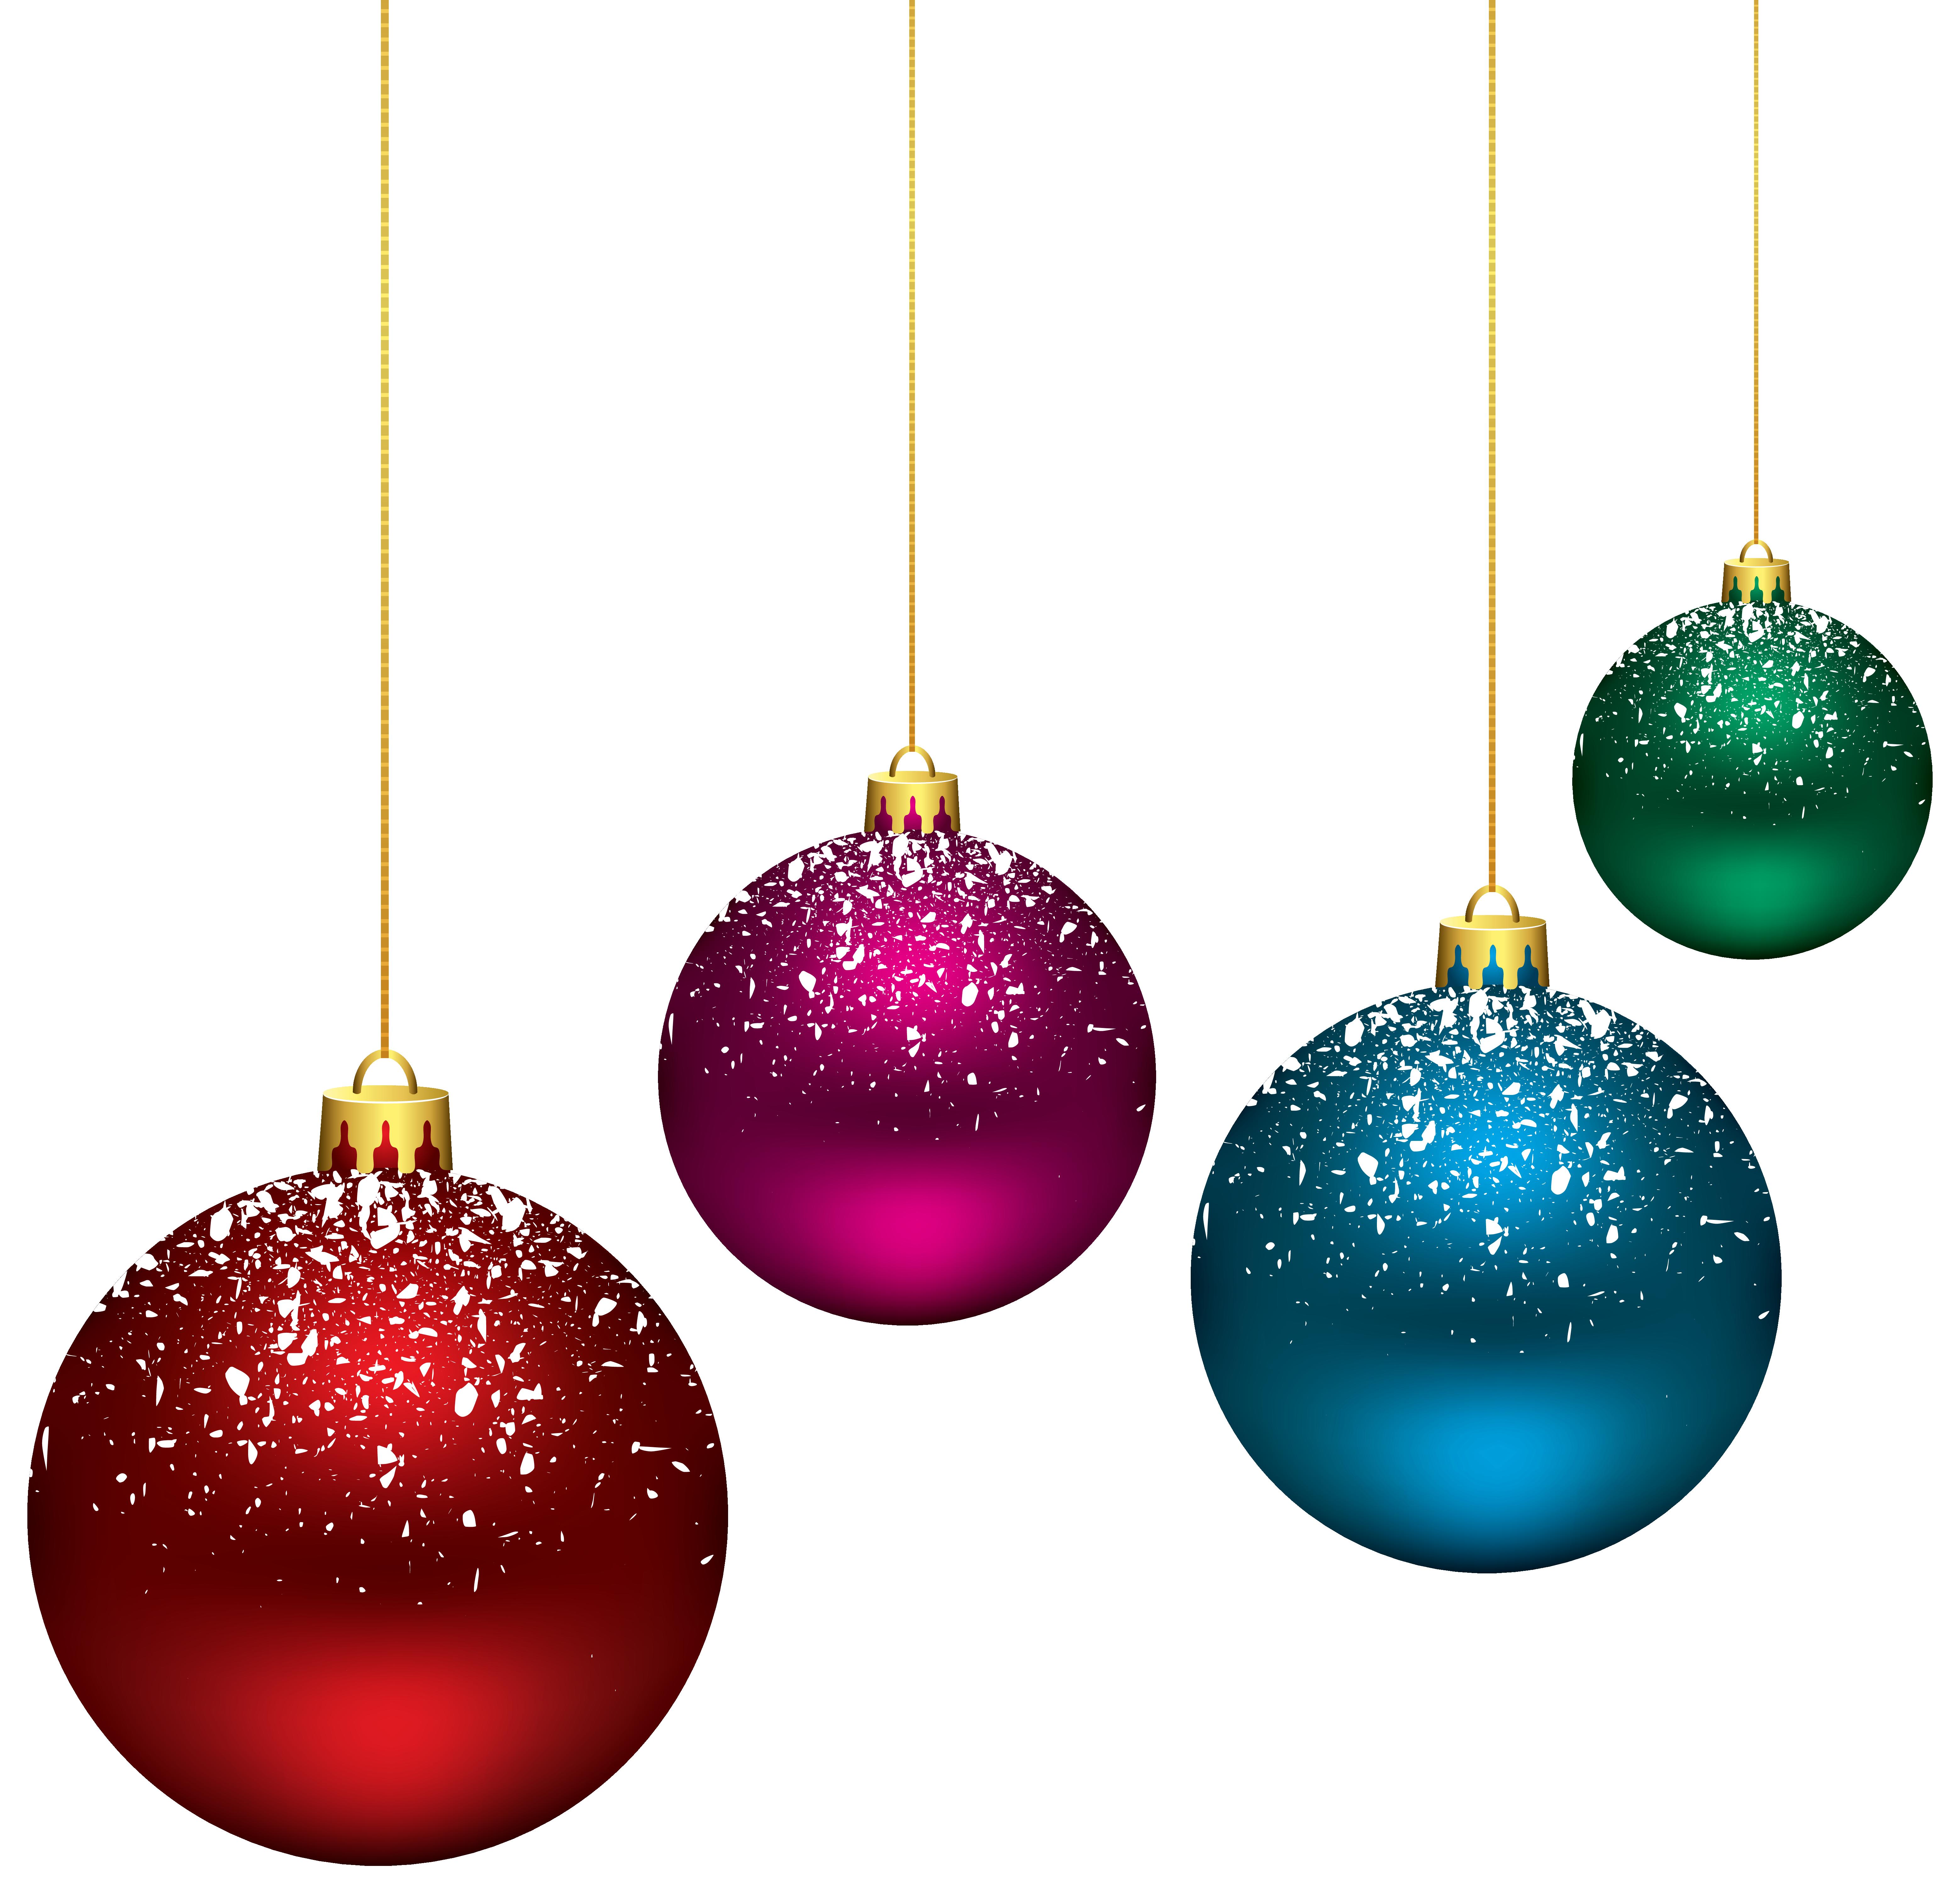 6232x6034 Christmas Snowy Balls Png Clip Art Imageu200b Gallery Yopriceville